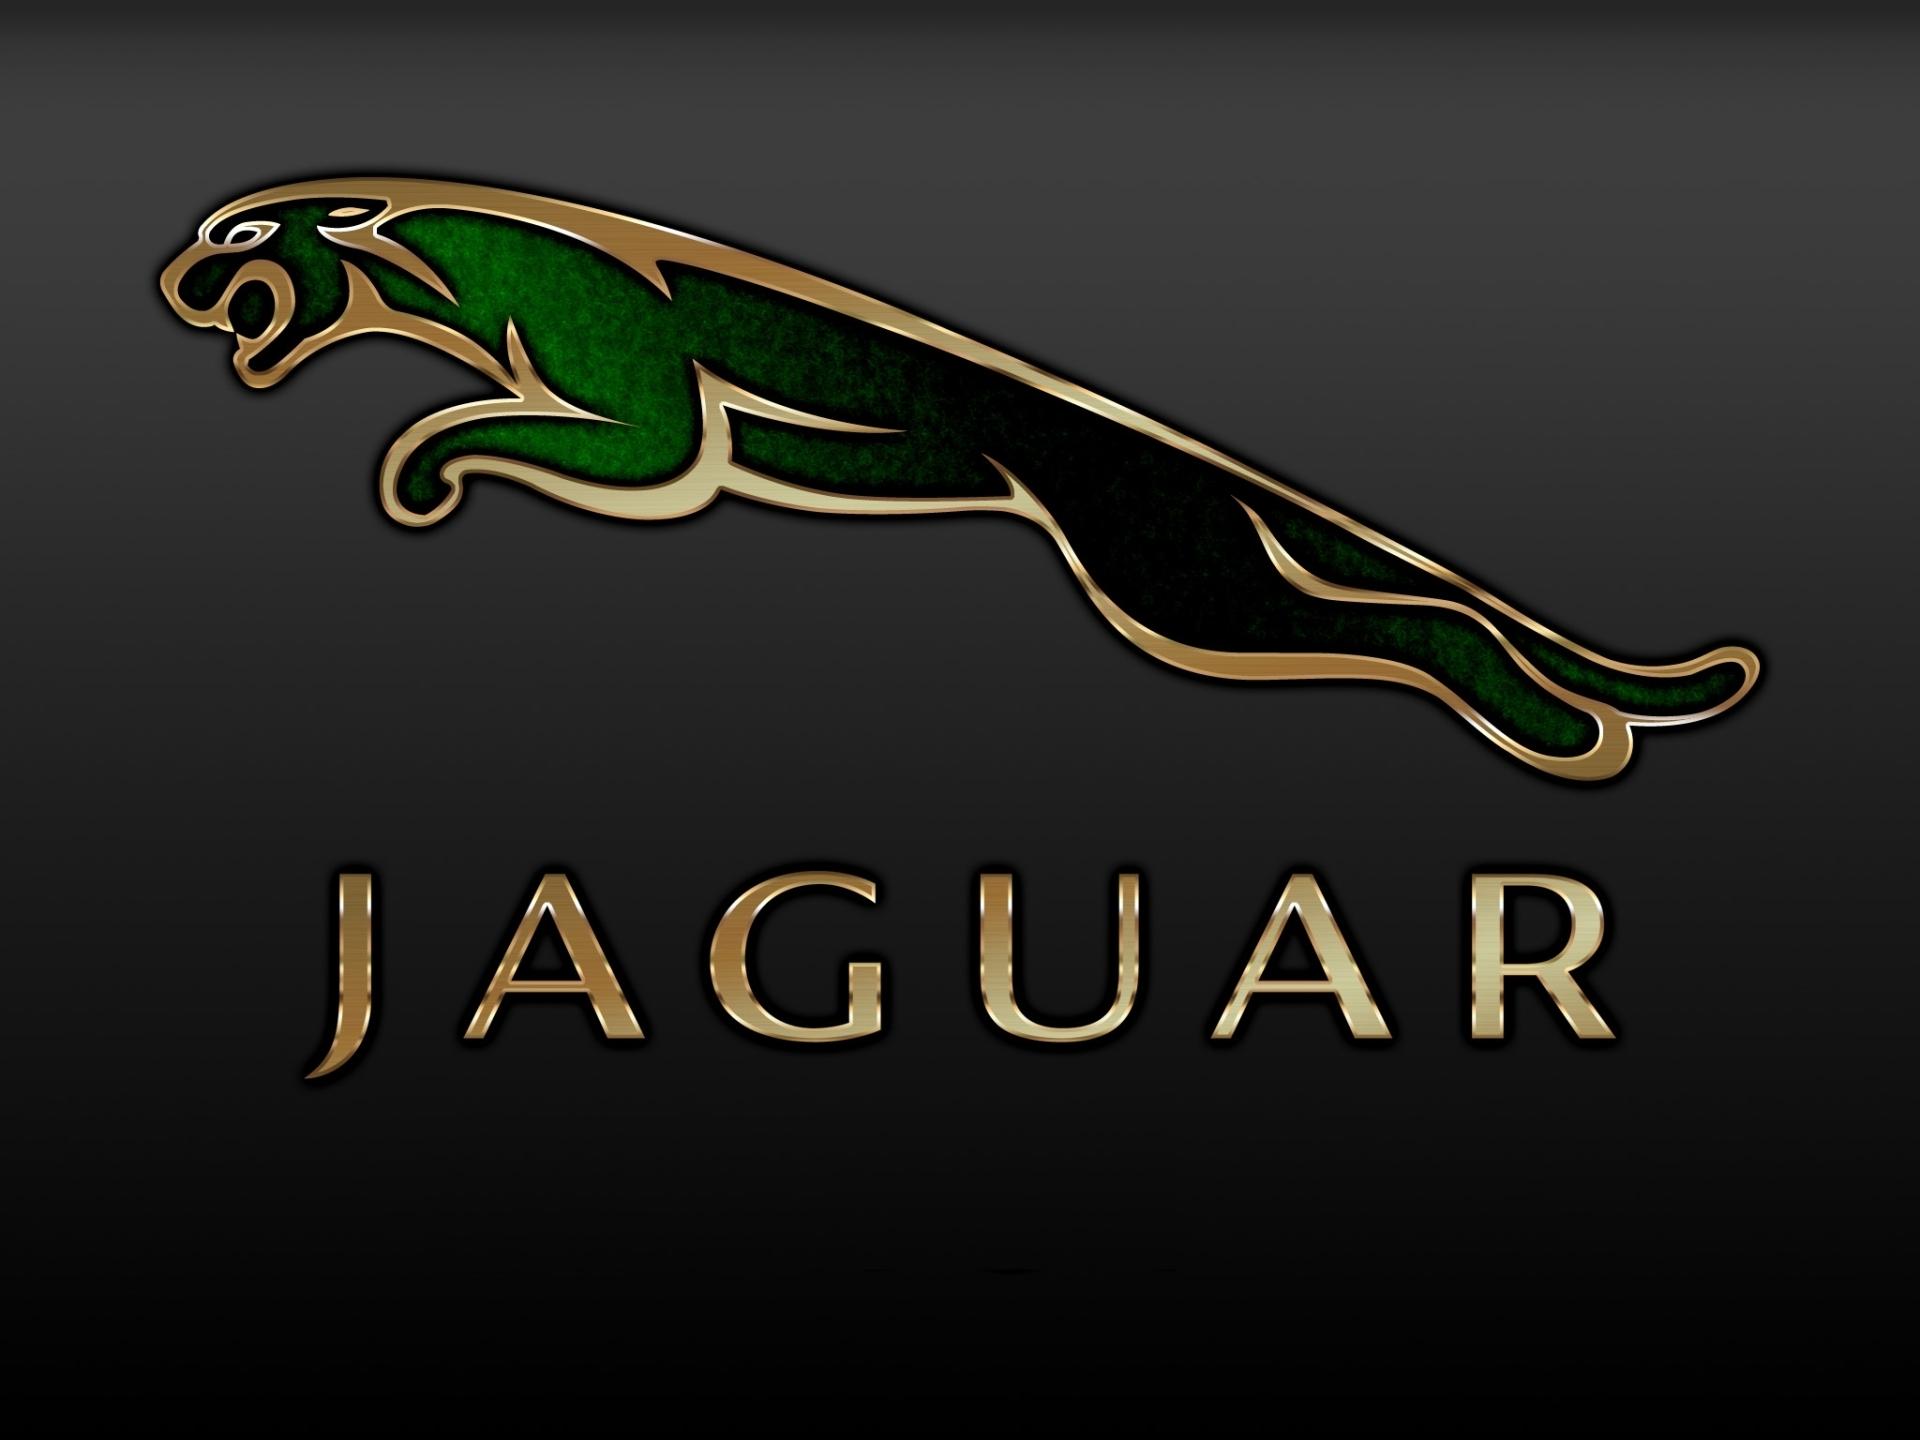 Jaguar Logo Wallpapers Pictures Images